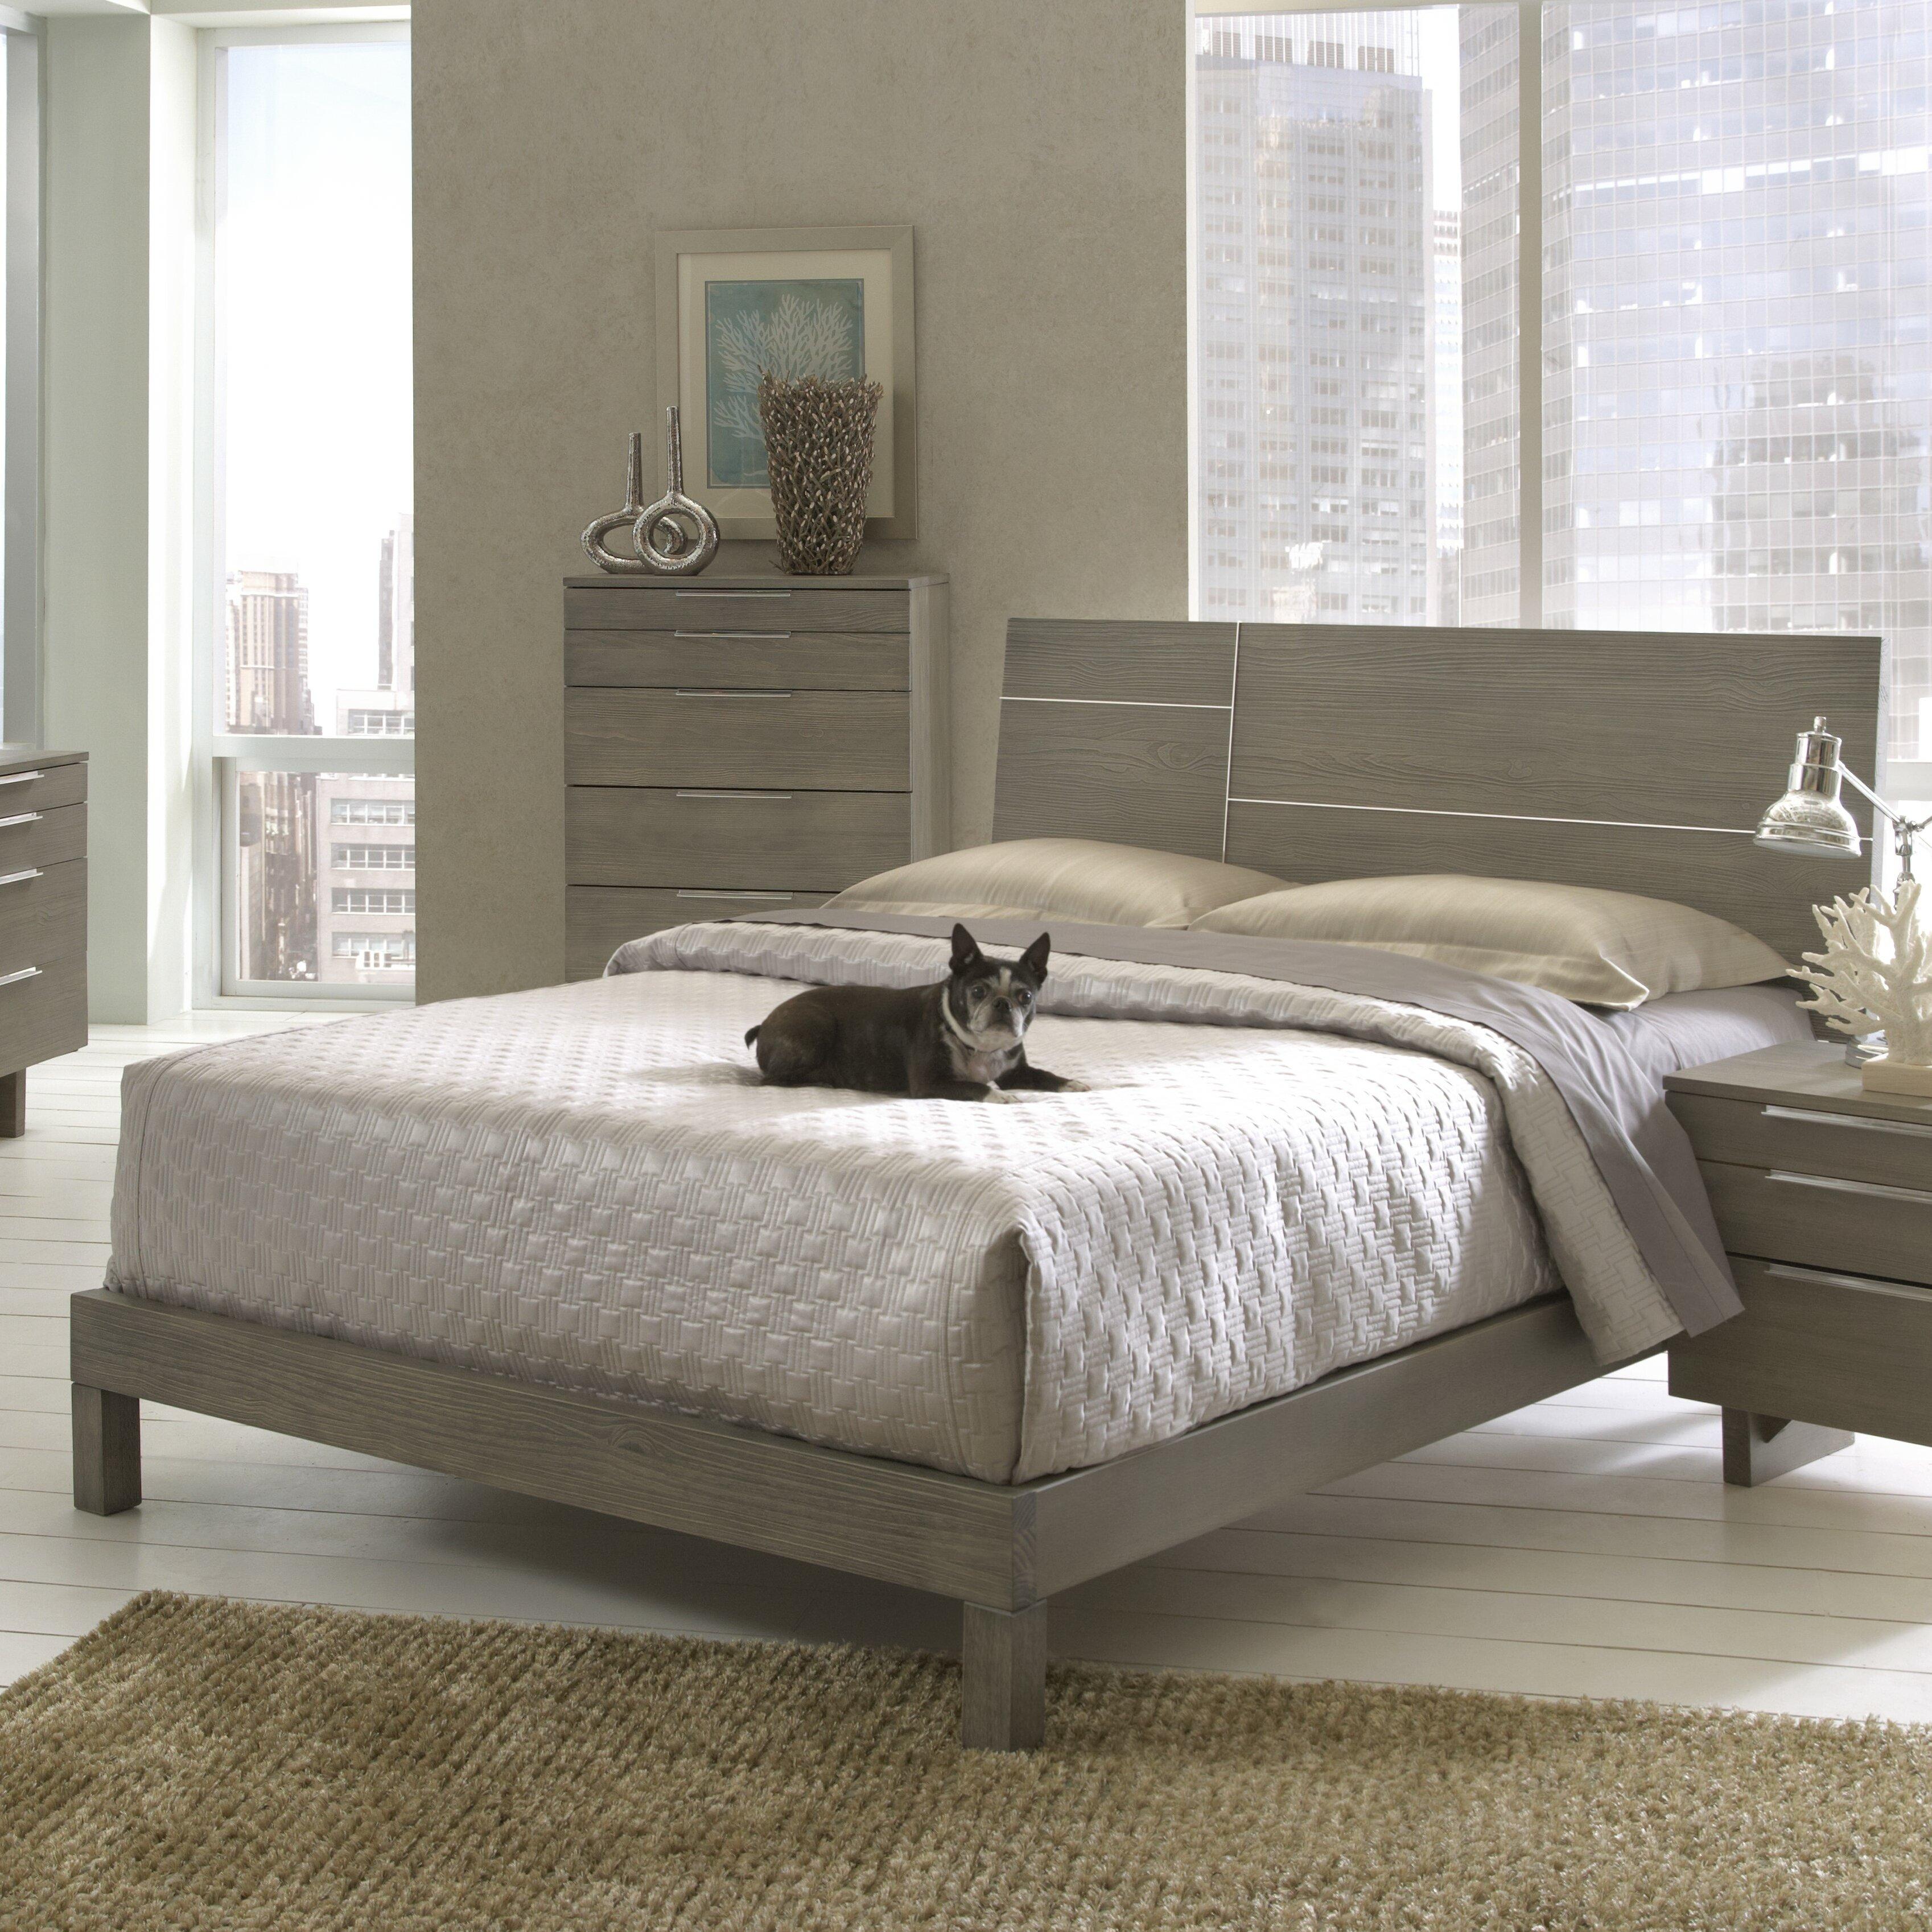 Wildon Home Violet Platform Customizable Bedroom Set Reviews Wayfair